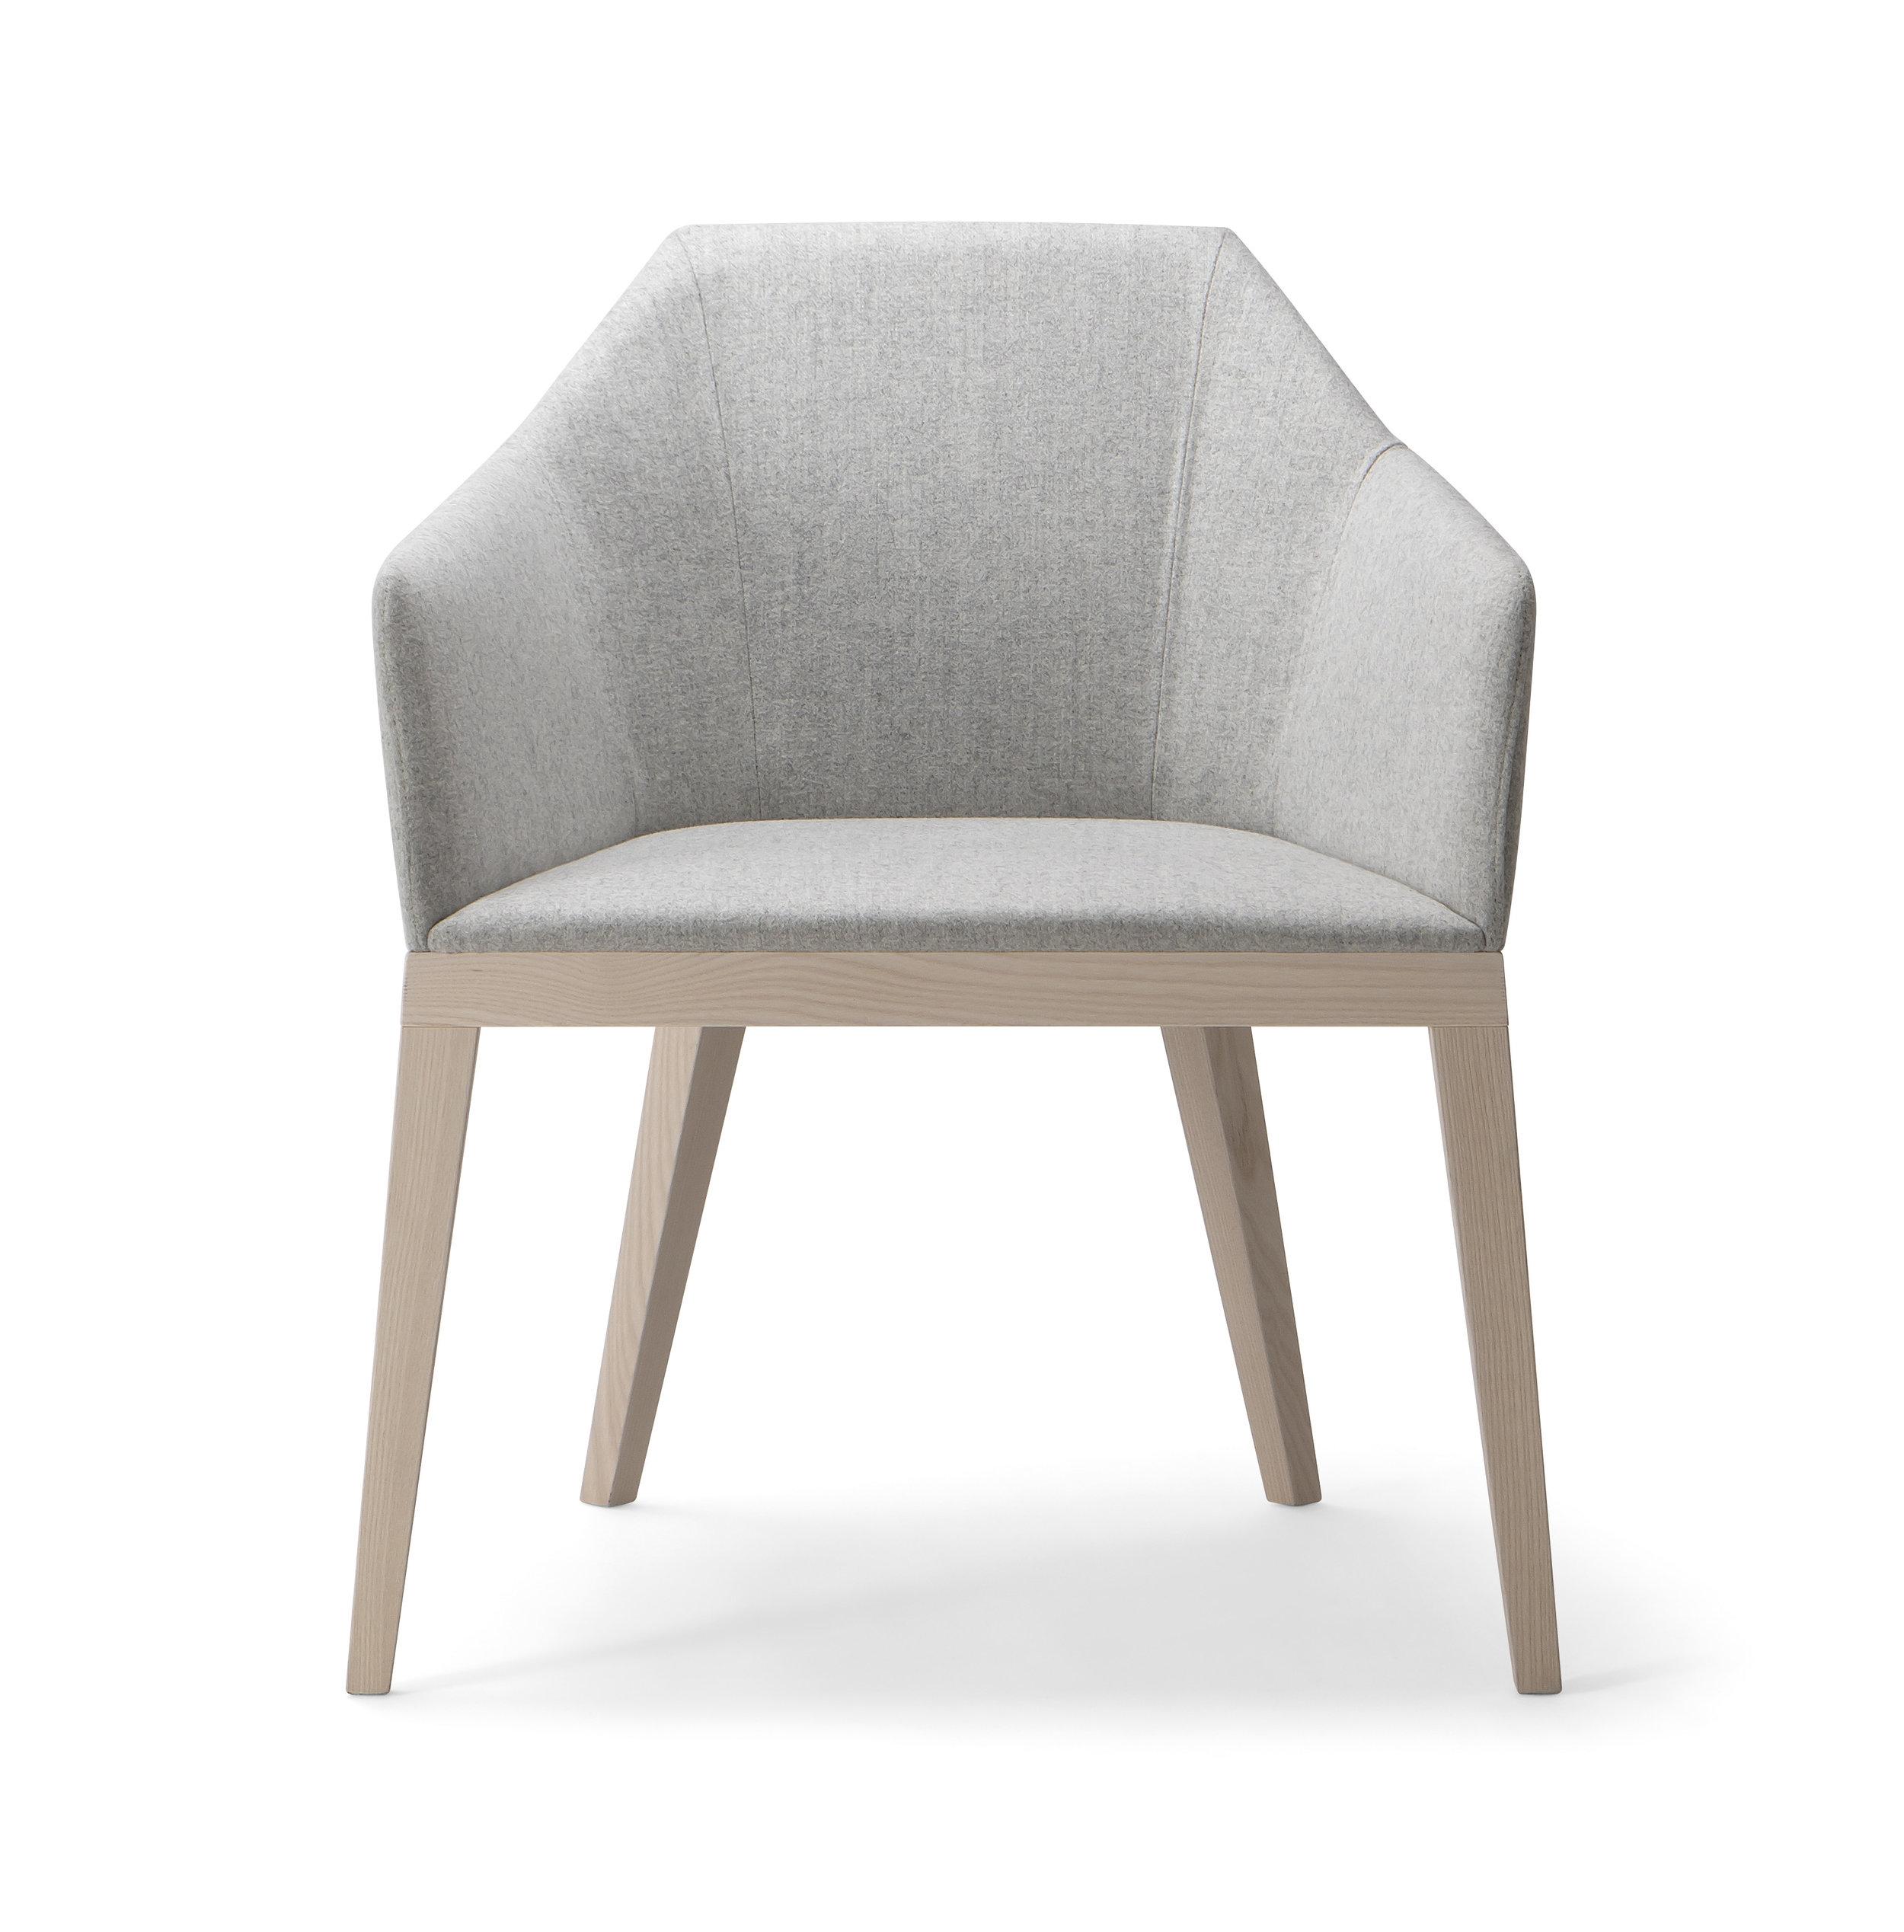 Rock Lounge Chair - Verti SRL